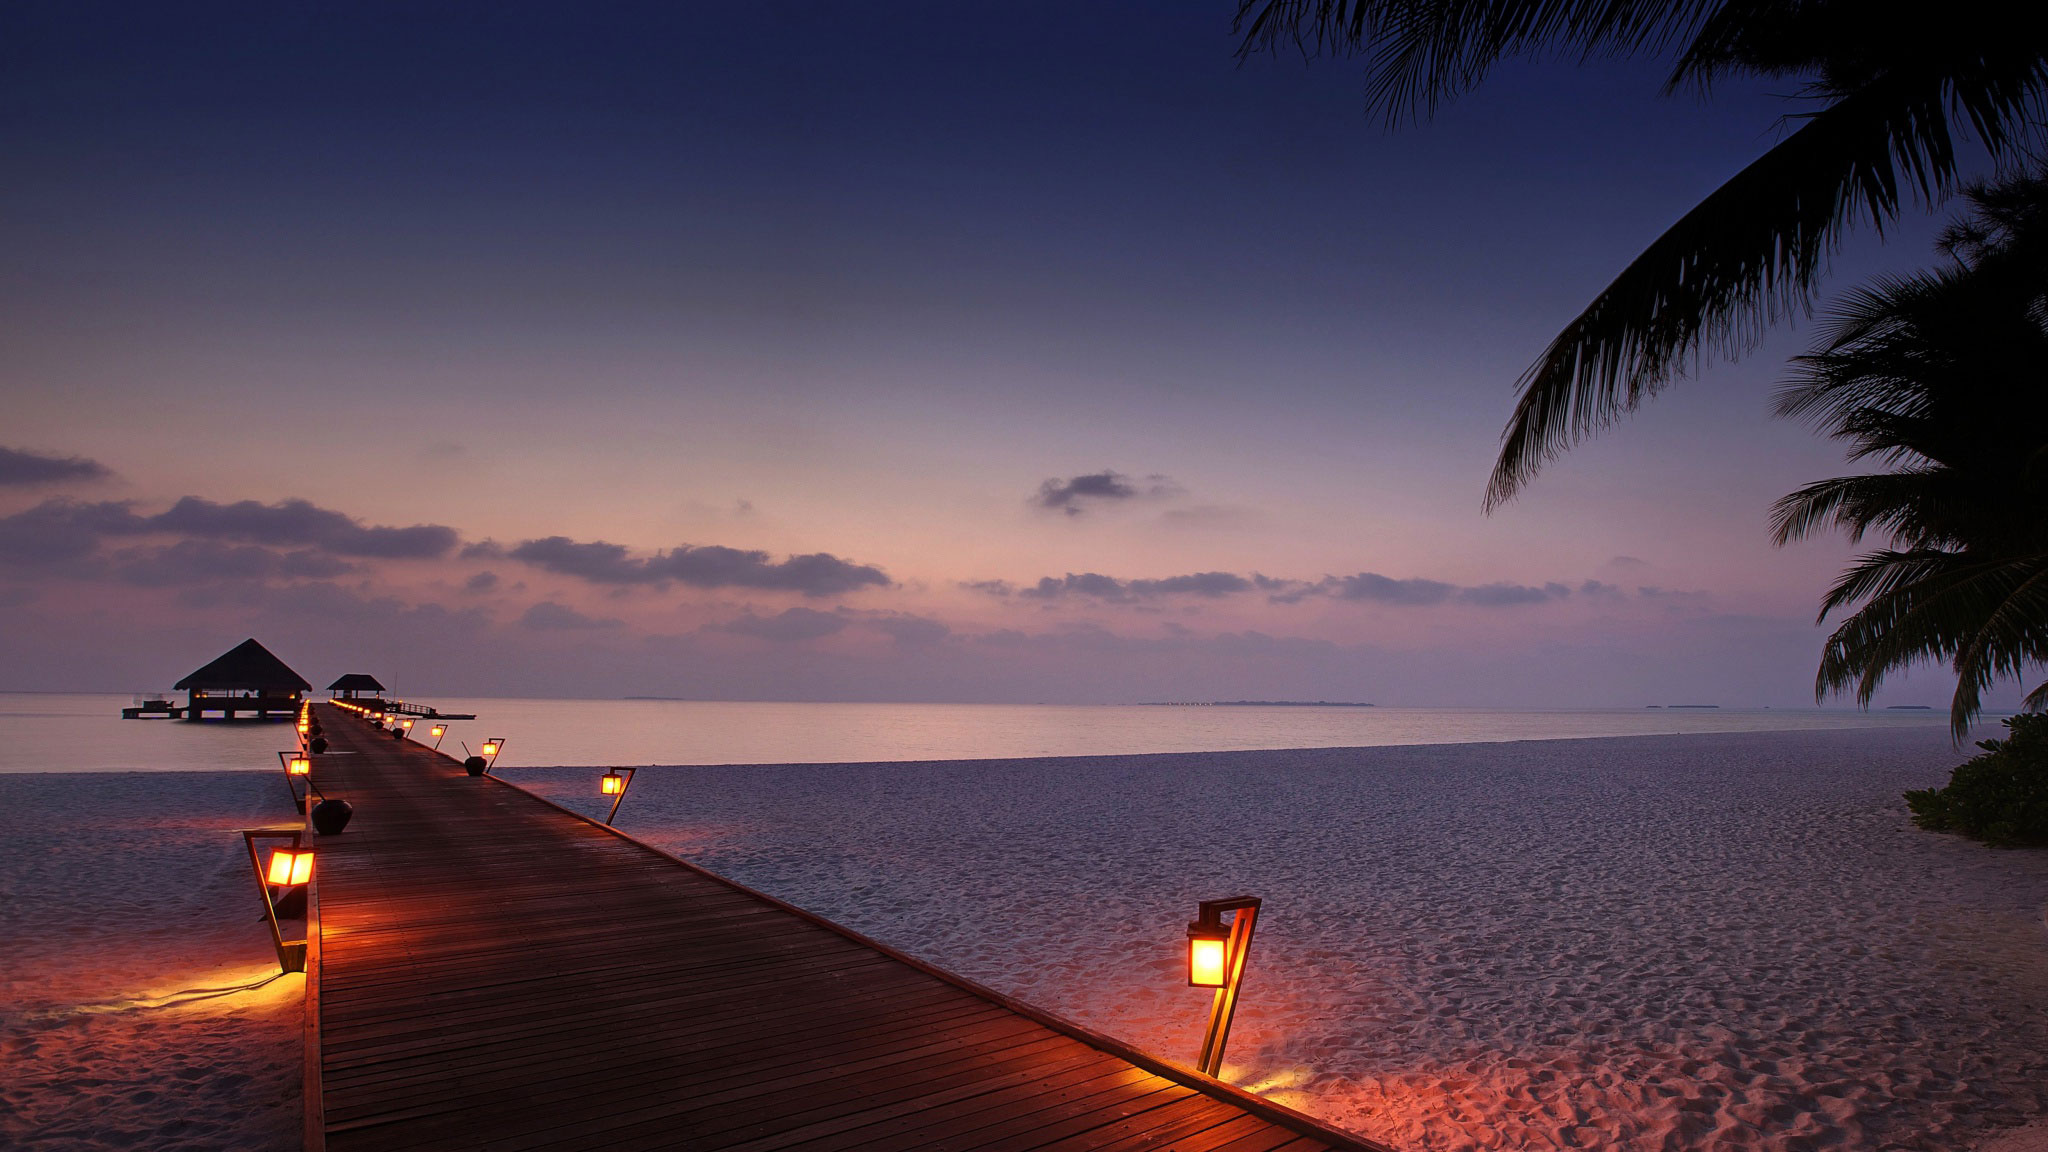 70623-sky-resort-horizon-evening-sunset-2048x1152